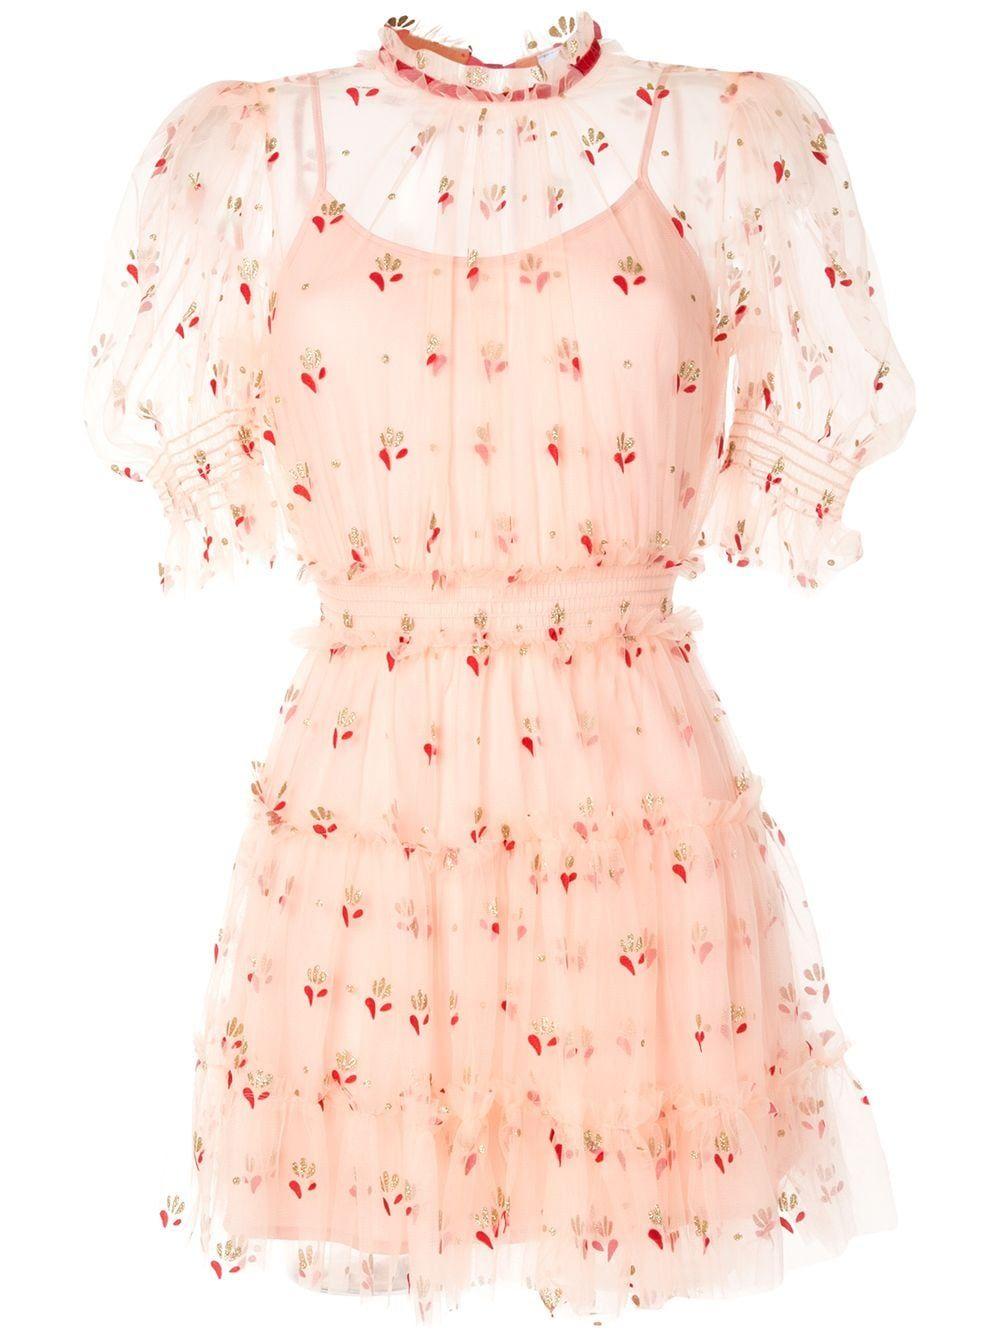 Alice Mccall Cowboy Tears Sheer Dress Farfetch Sheer Dress Casual Dress Outfits Fashion Dresses [ 1334 x 1000 Pixel ]